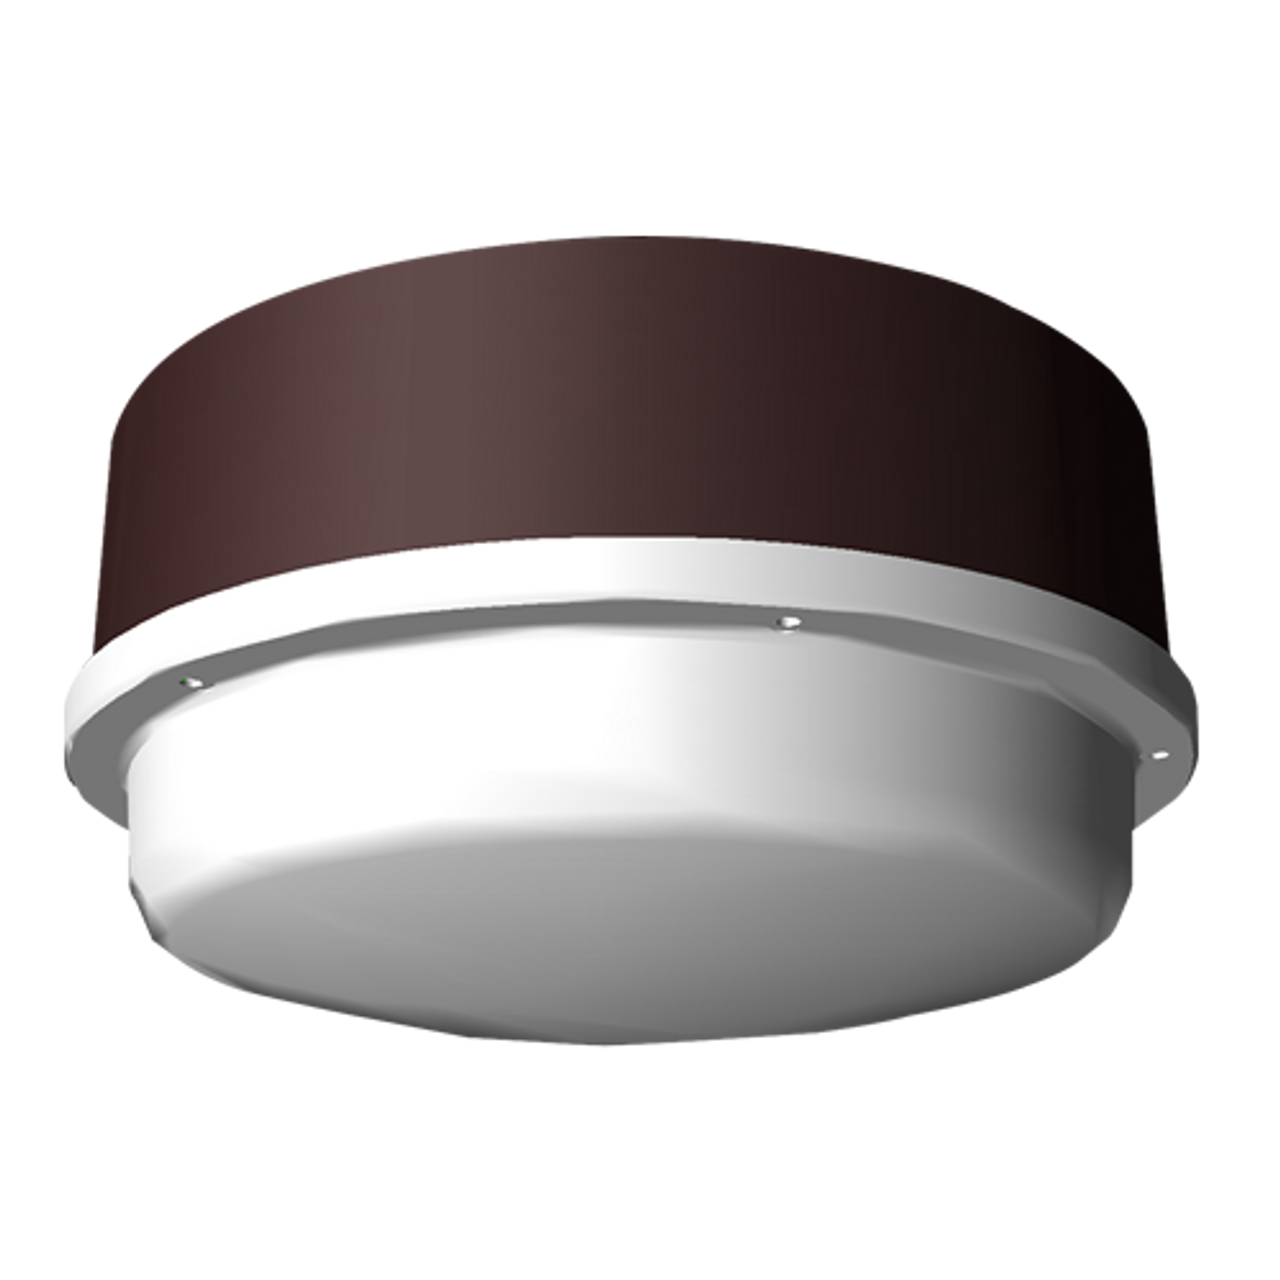 34 Watt Round LED Canopy Light